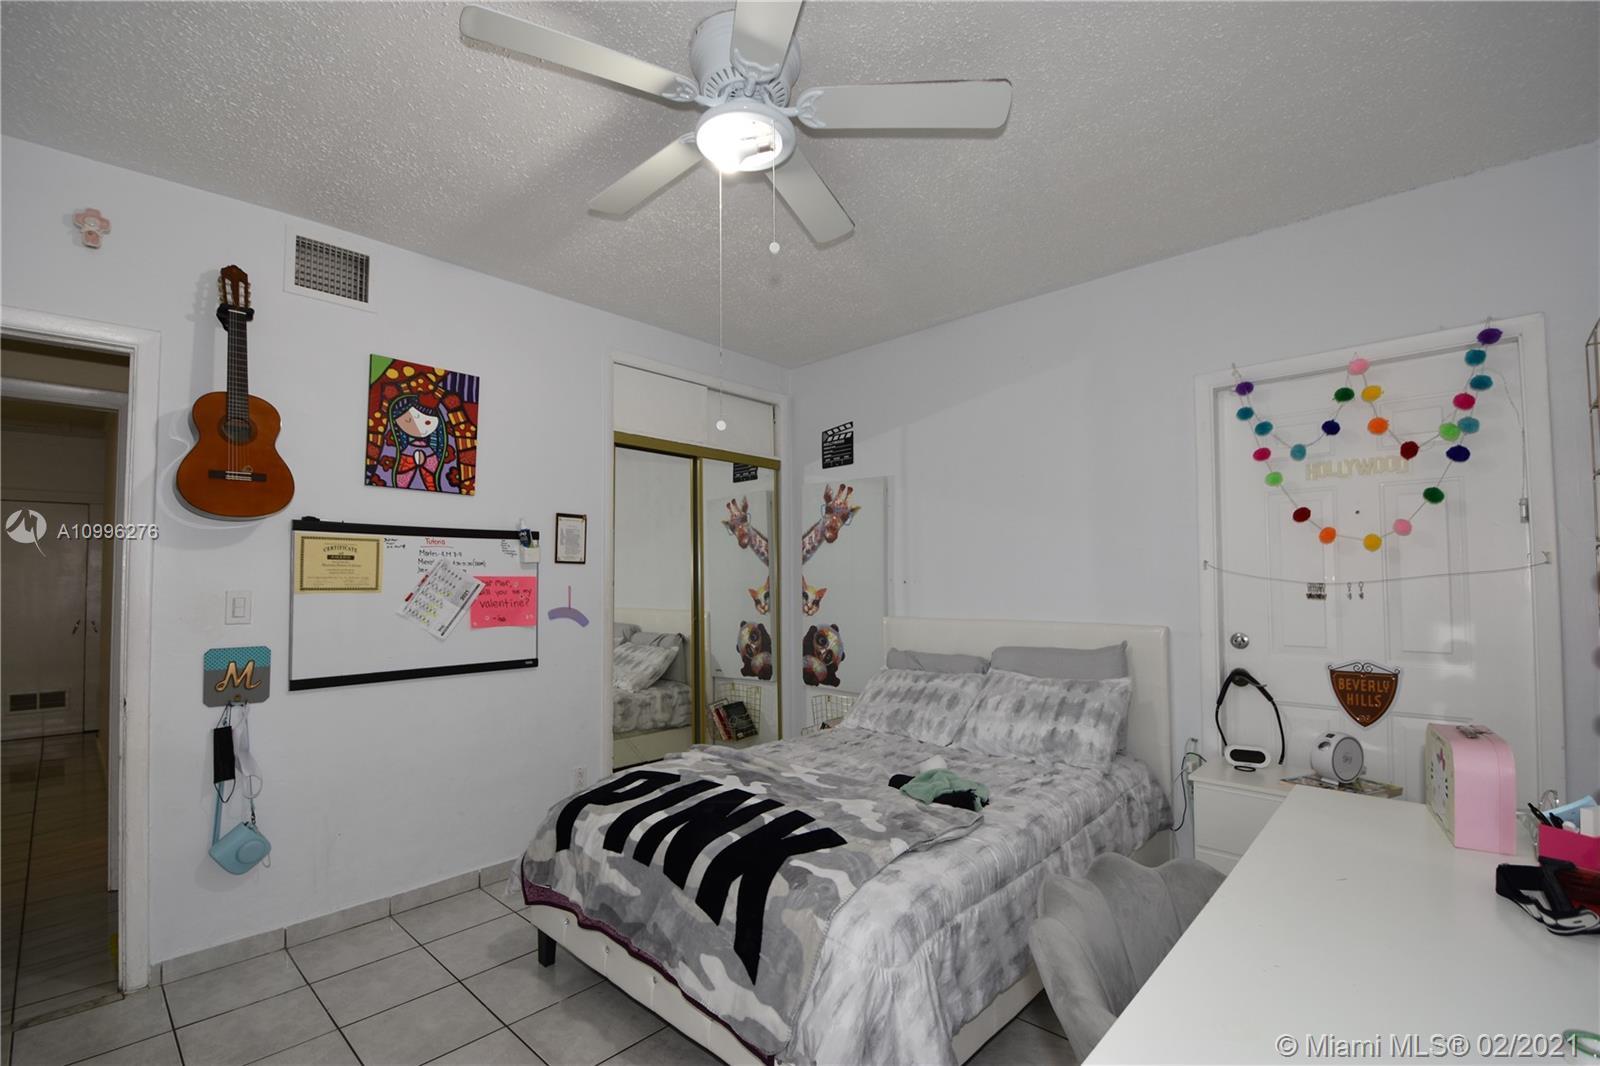 Sky Lake, 2110 NE 191st Dr, North Miami Beach, Florida 33179, image 23